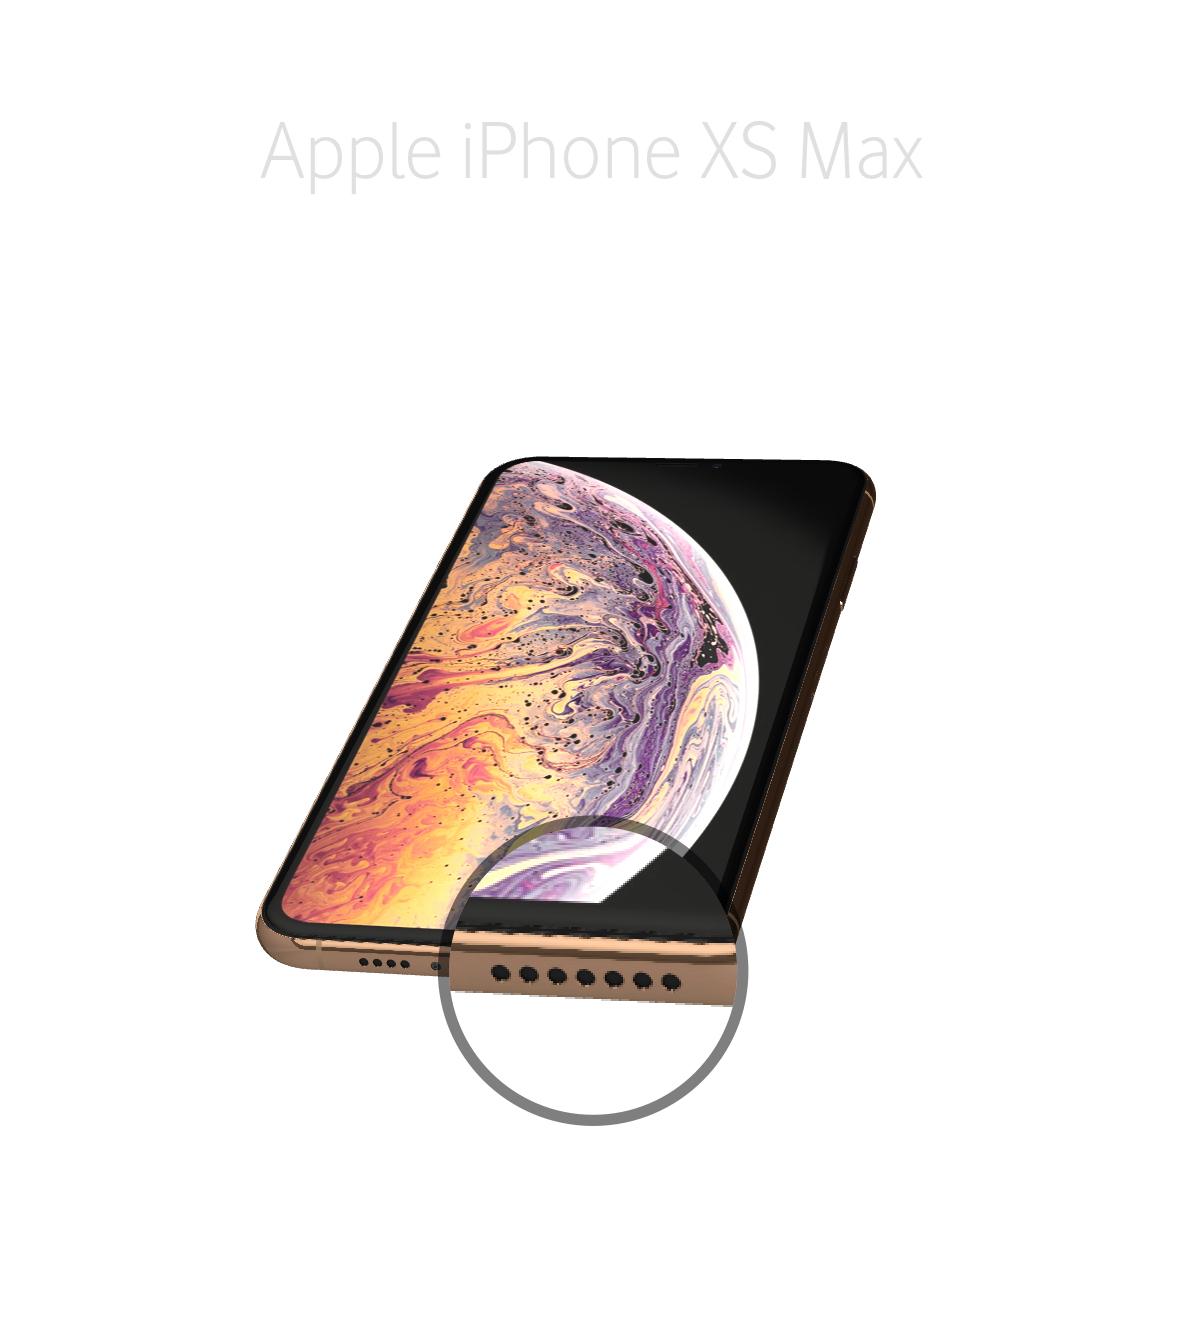 Laga högtalare iphone Xs Max